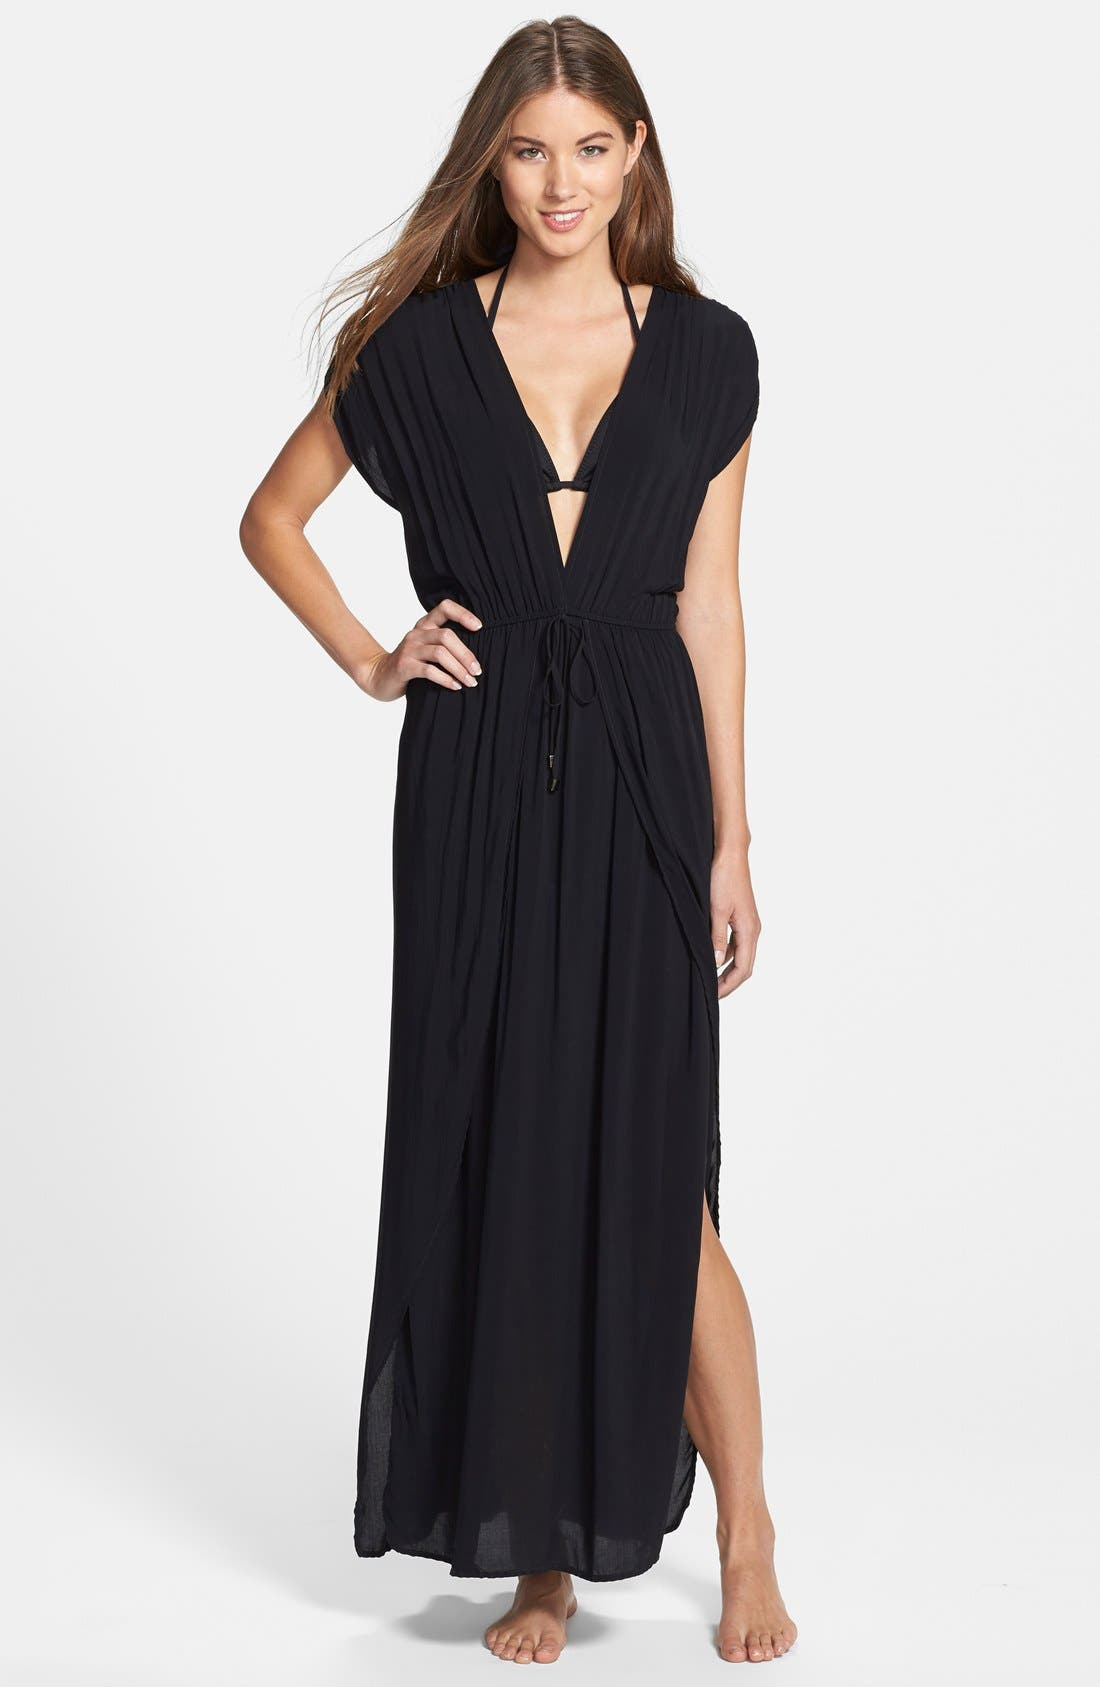 Elan Deep V-Neck Cover-Up Maxi Dress, Black